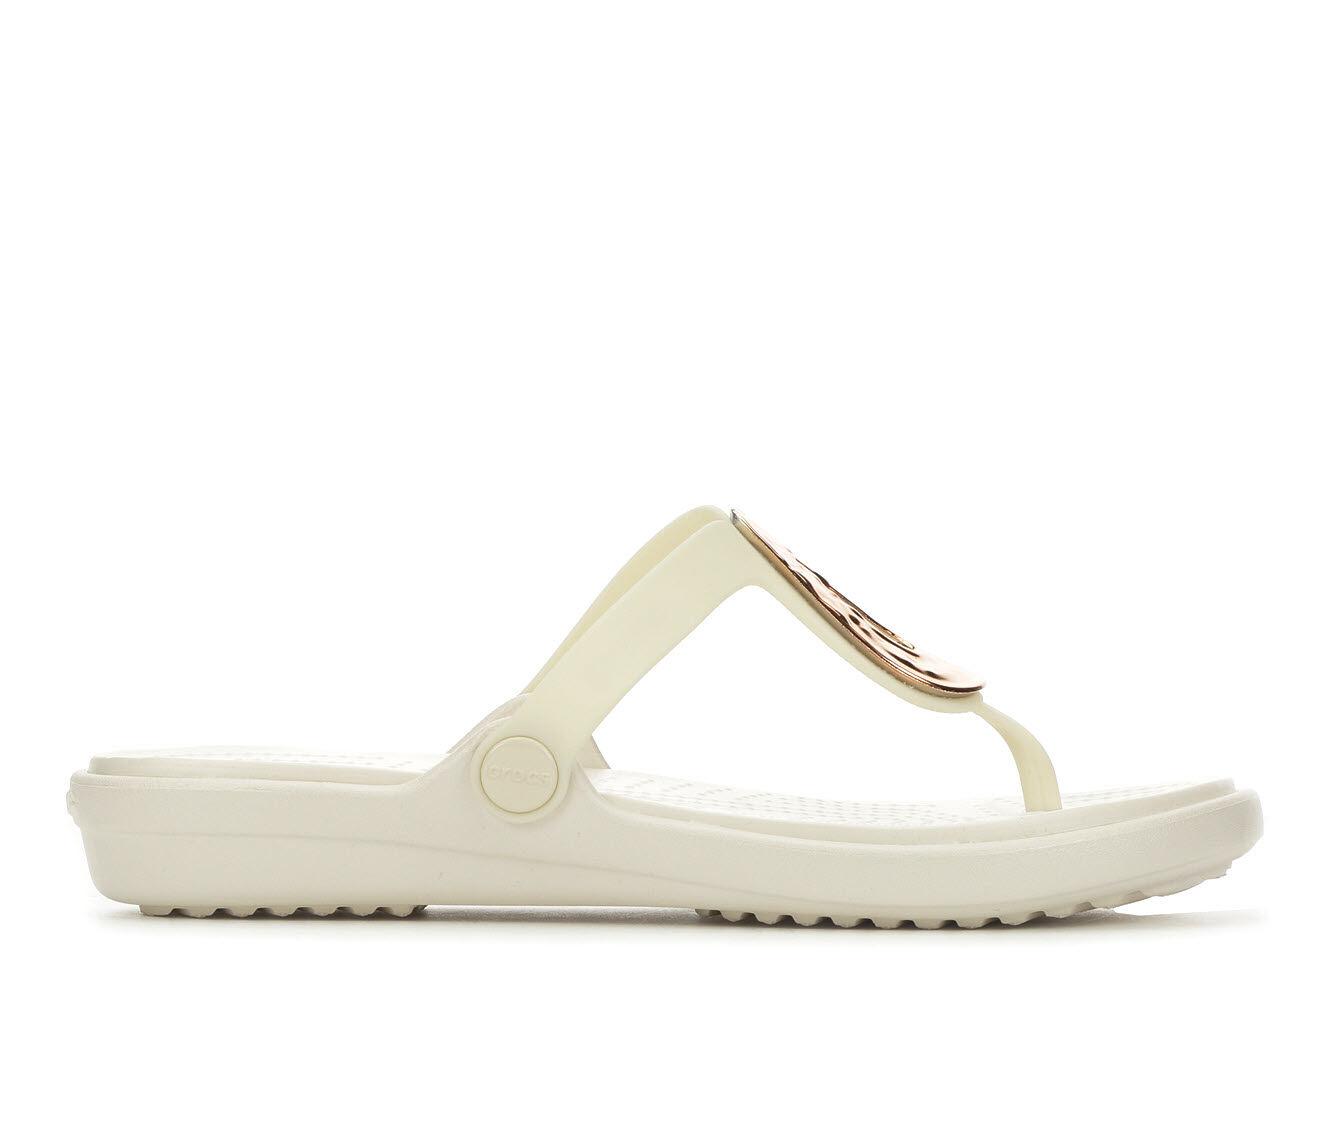 Women's Crocs Sanrah Metallic Flip-Flop Rose Gold/Oyste